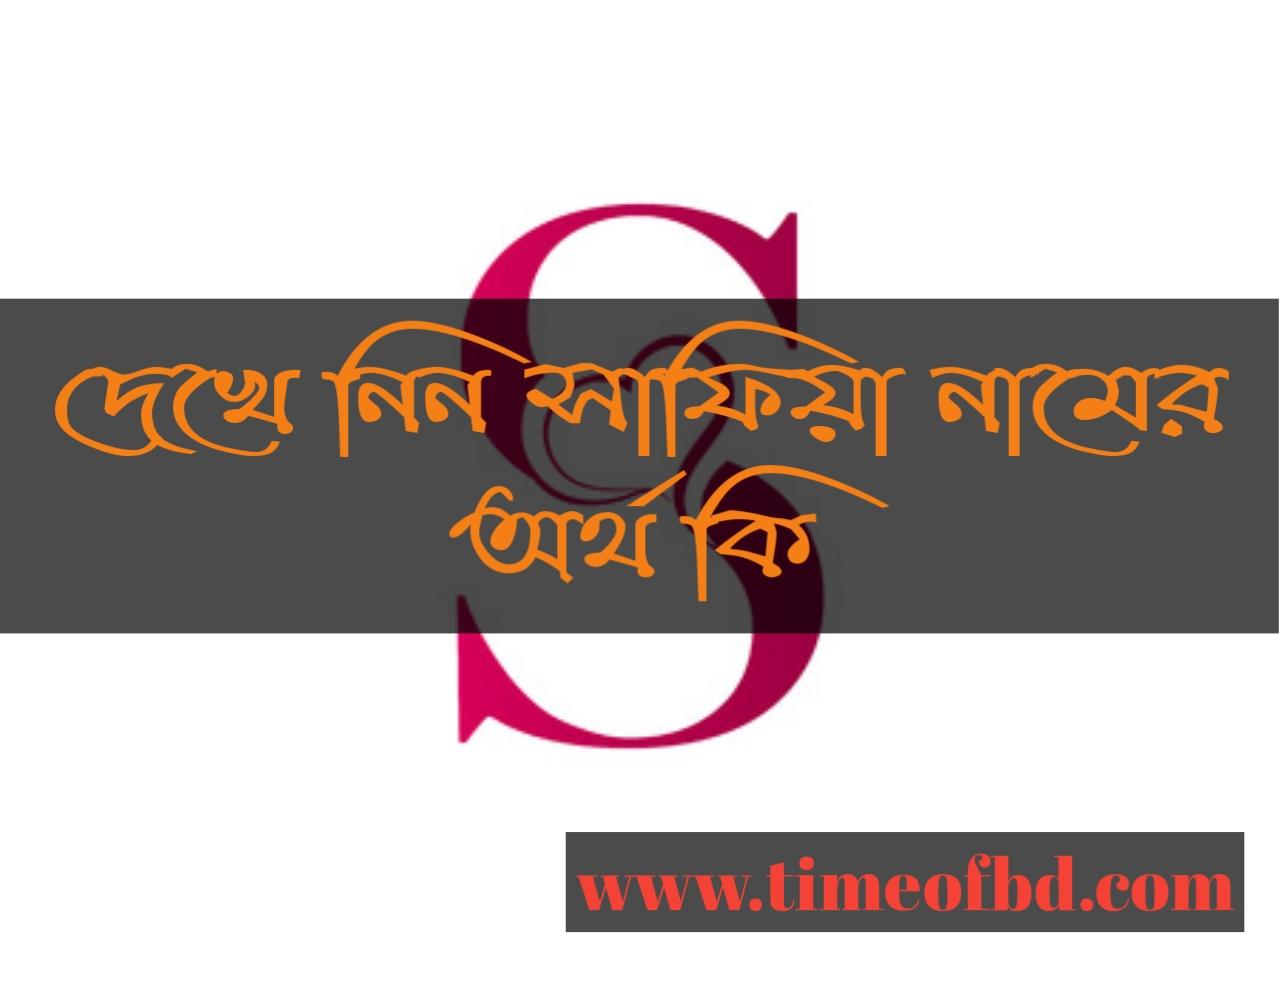 safiya name meaning in Bengali, সাফিয়া নামের অর্থ কি, সাফিয়া নামের বাংলা অর্থ কি, সাফিয়া নামের ইসলামিক অর্থ কি,